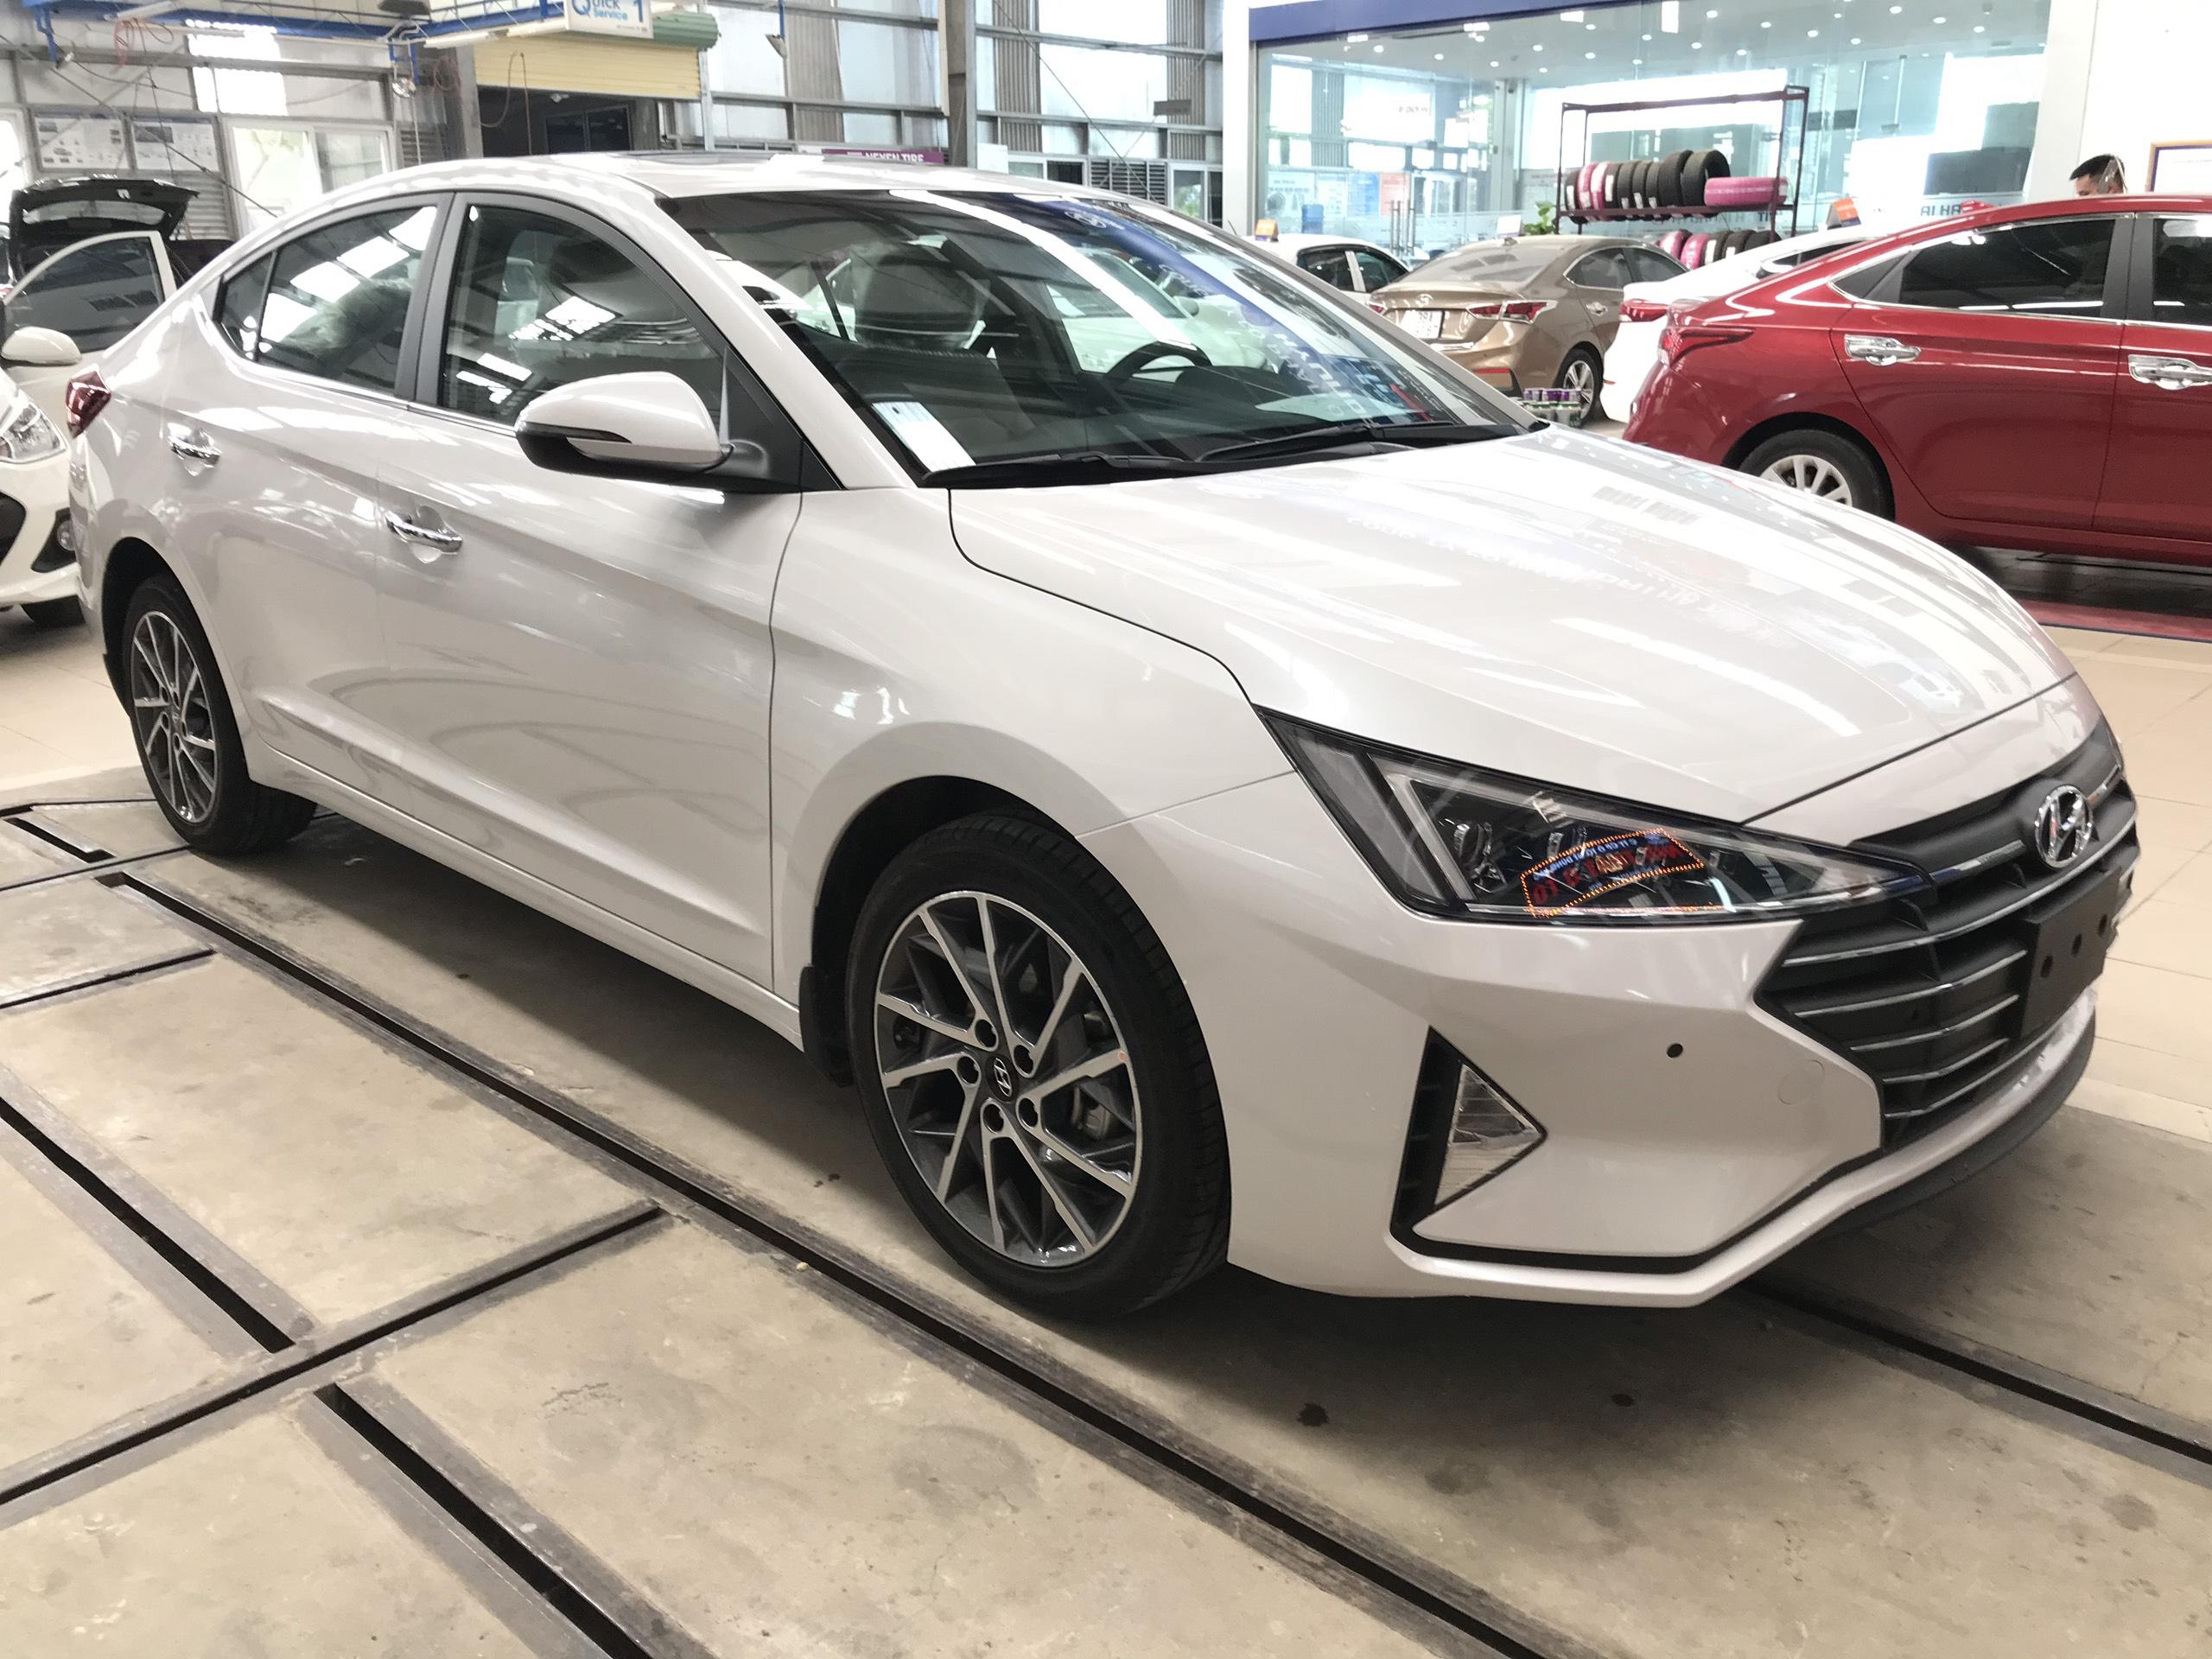 Hyundai ElanTra AD 2 6AT FL